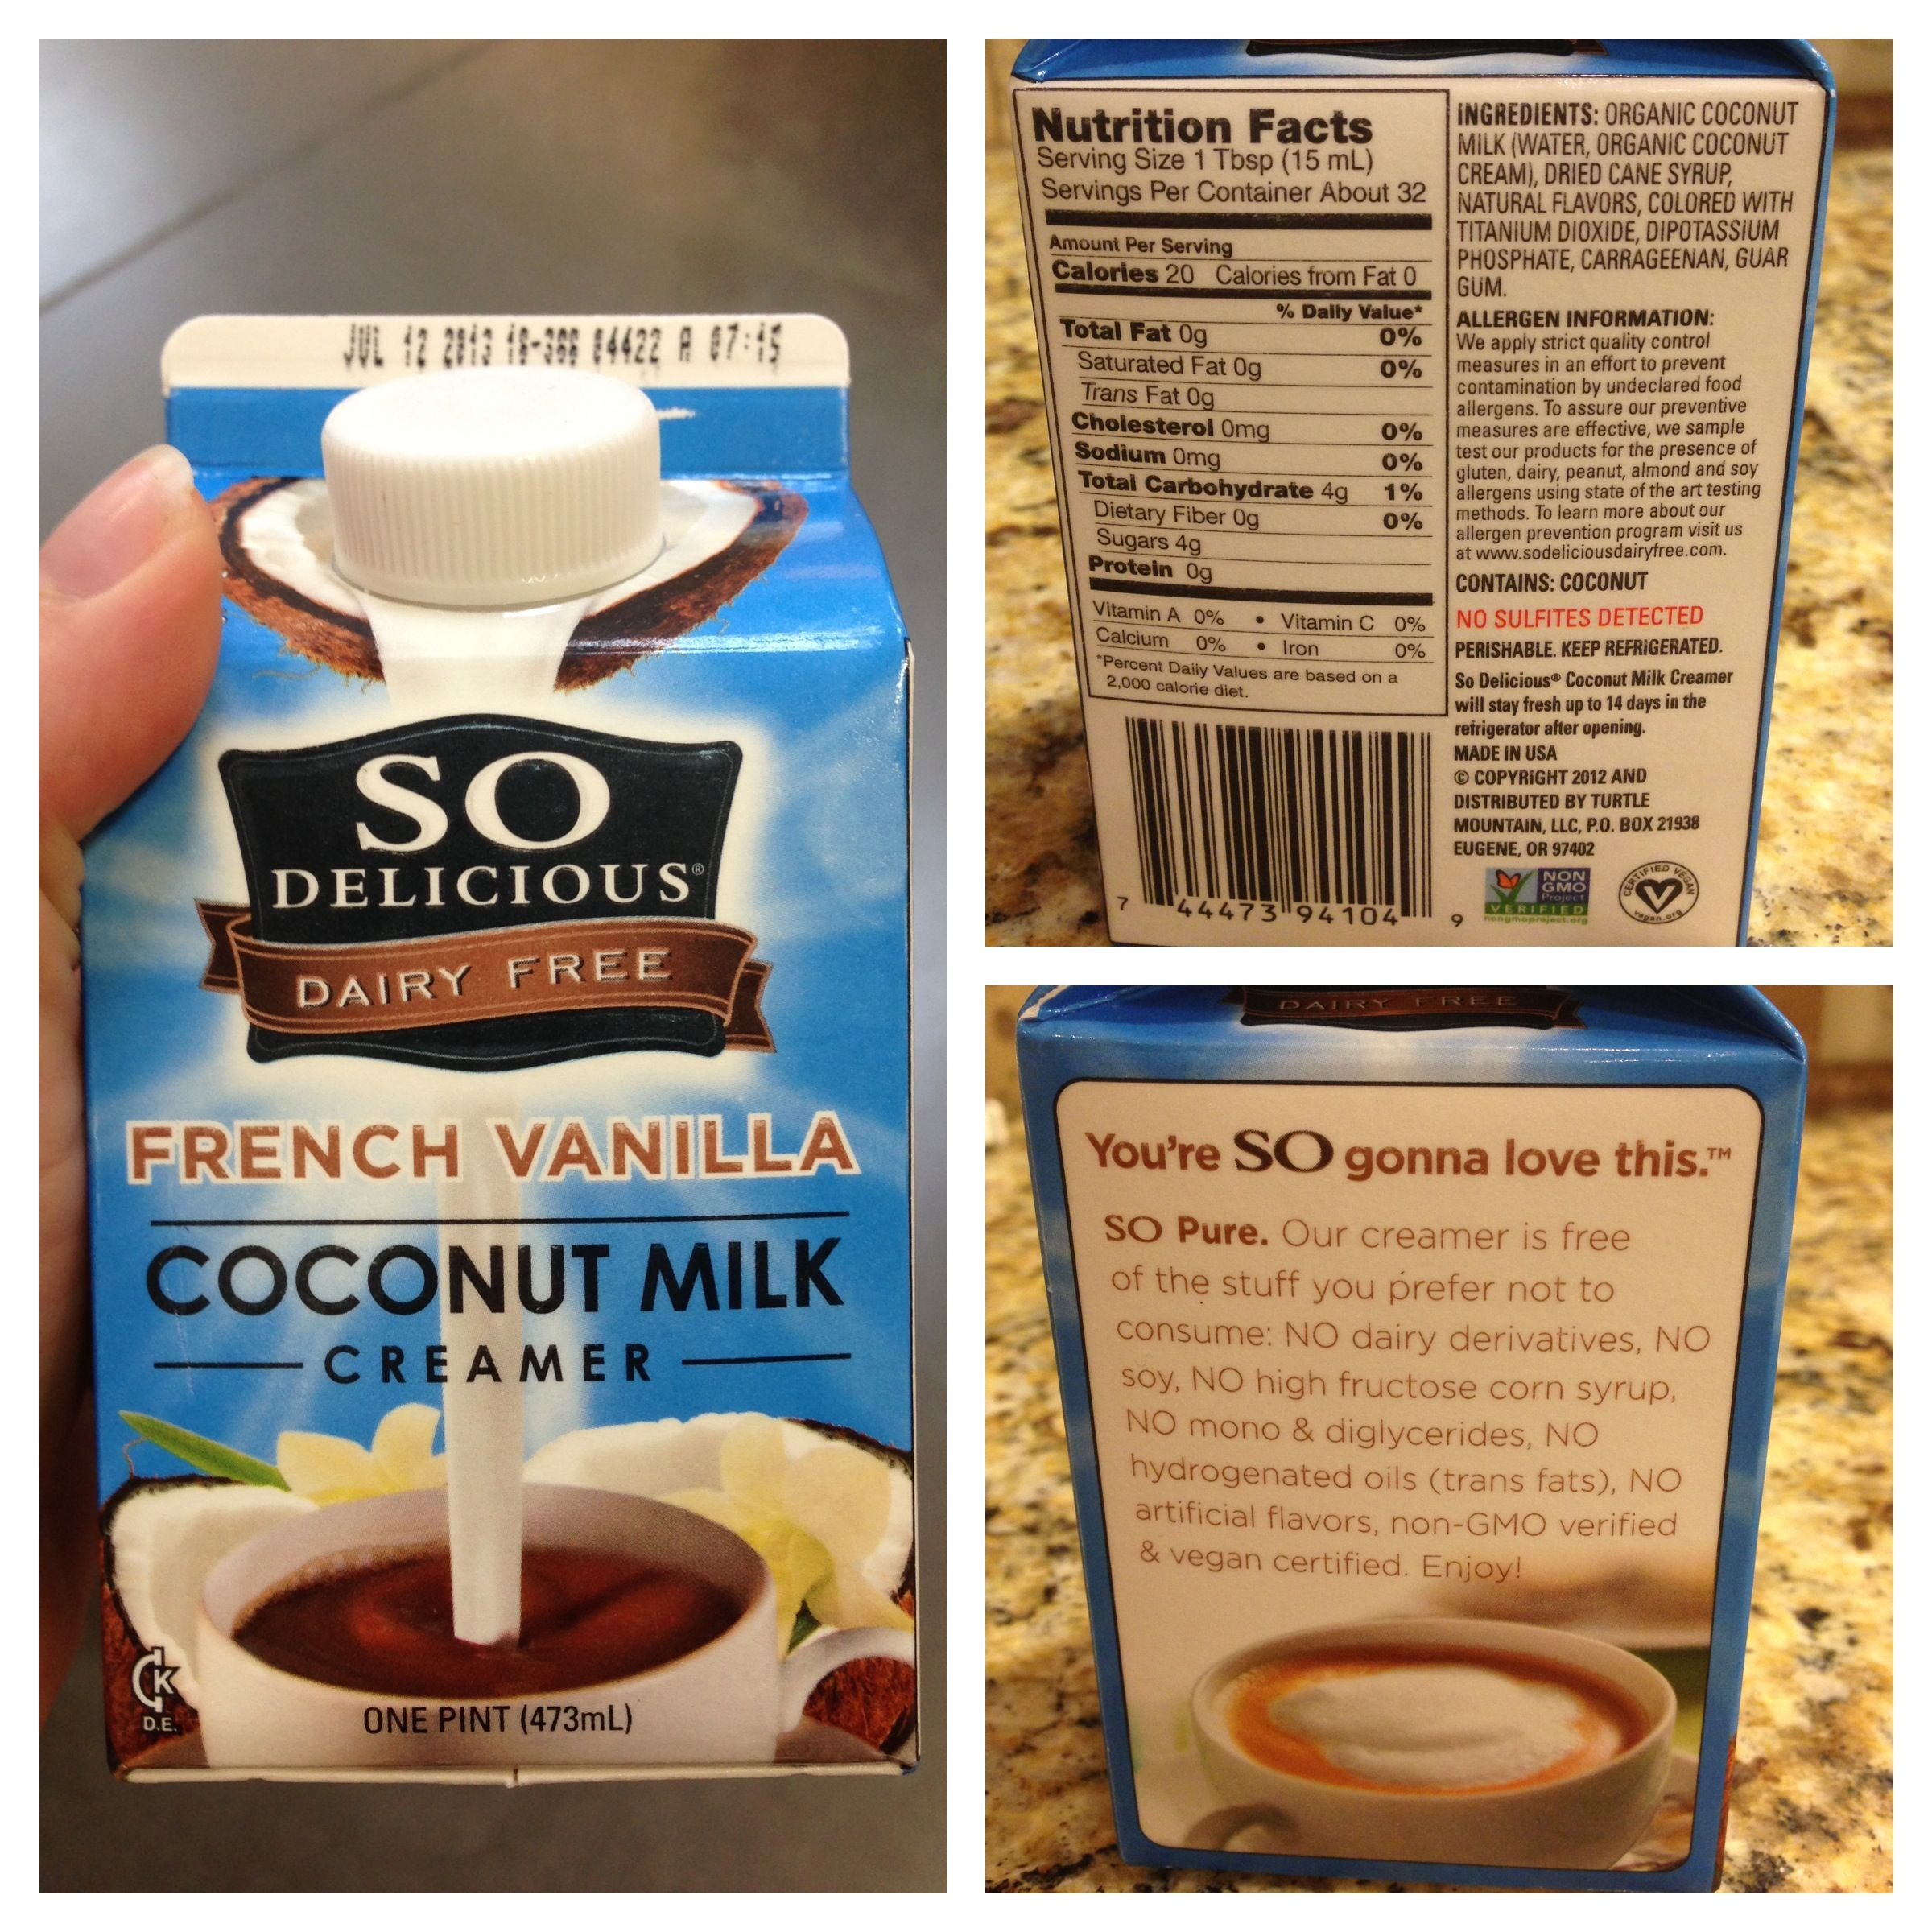 French Vanilla Creamer-- No dairy, no soy, no HFCS, no